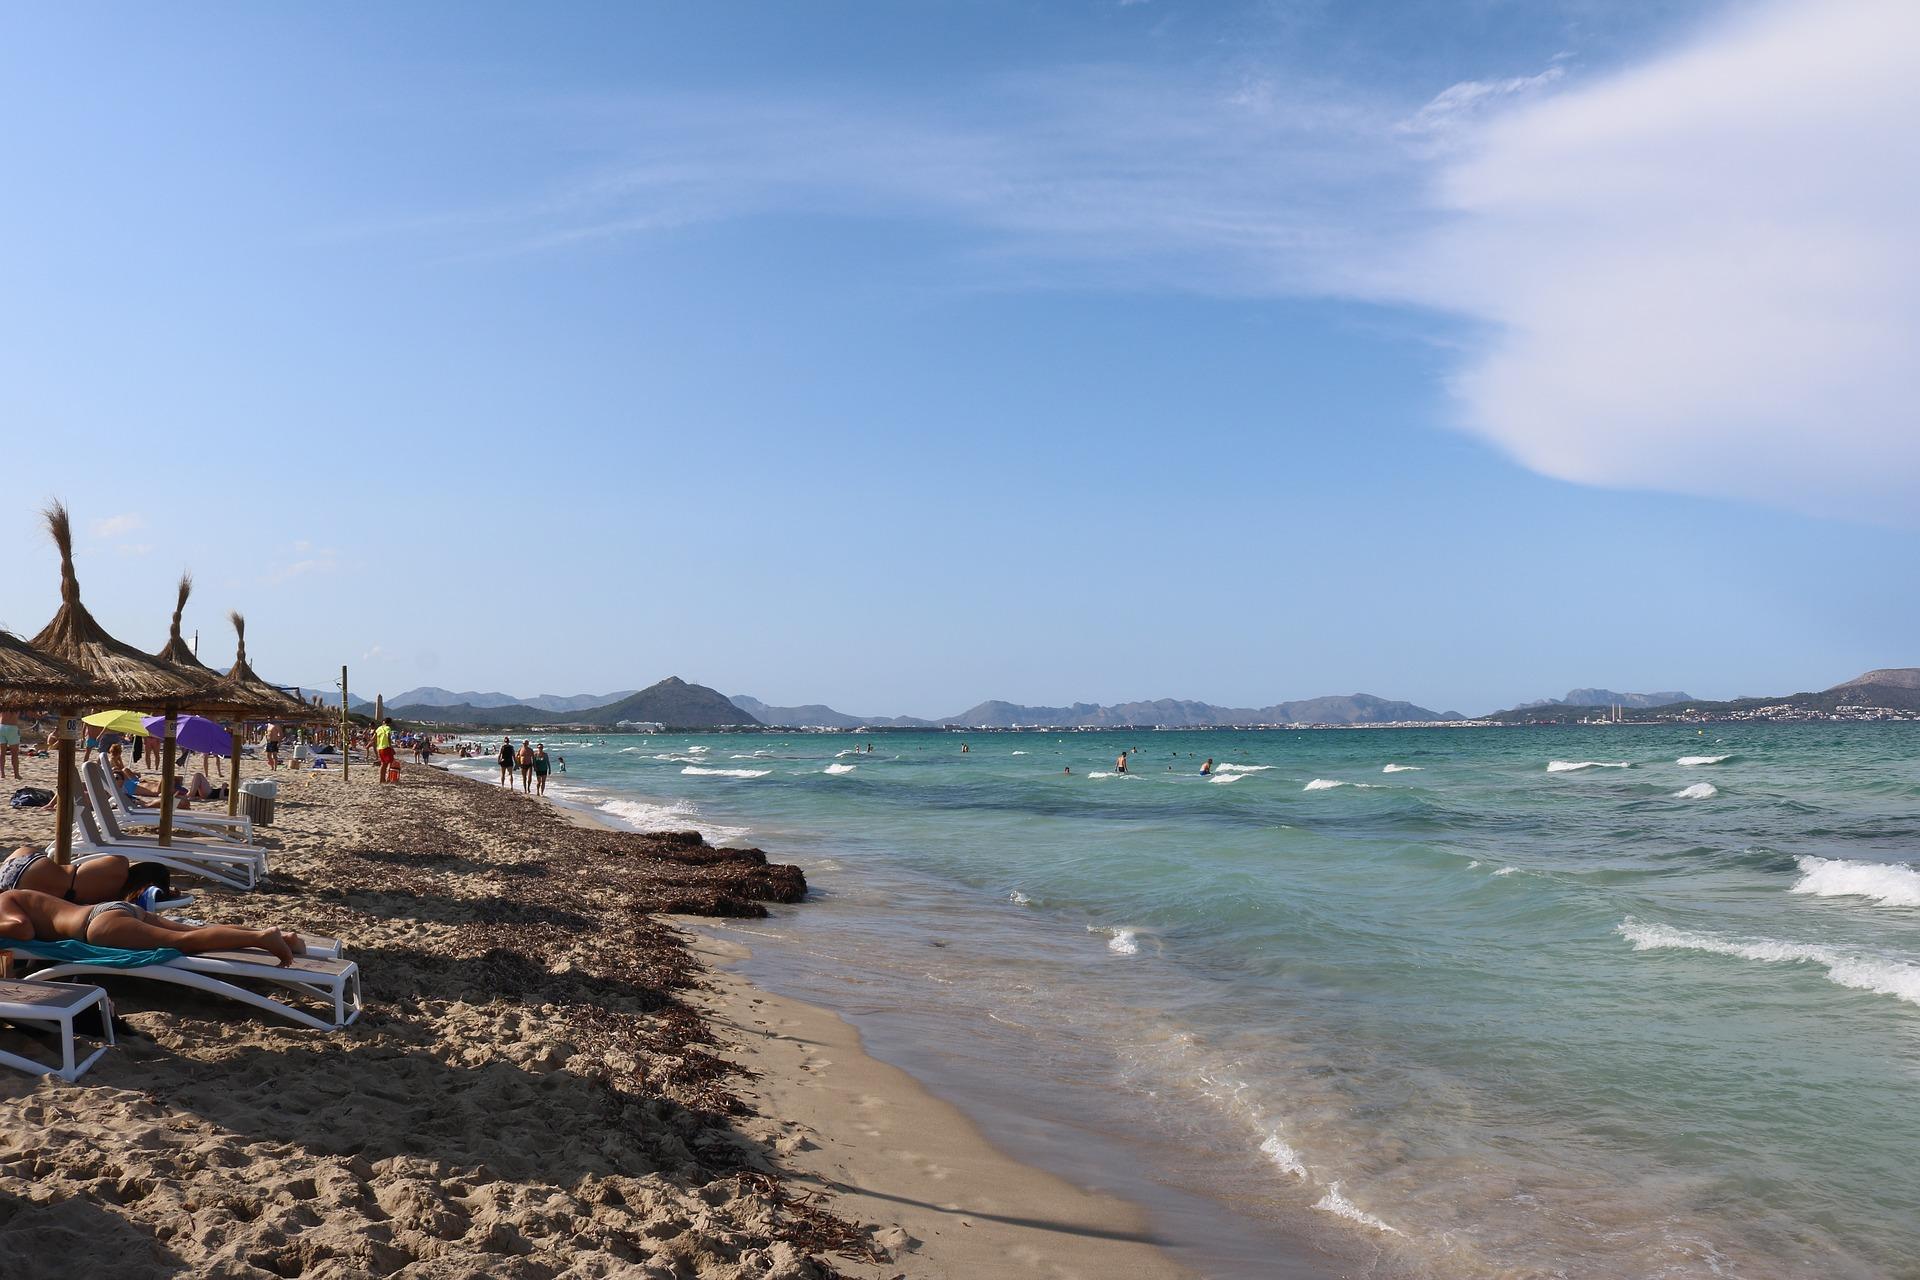 Als Single empfehle ich dir einfach direkt am Playa de Muro zu chillen, das Hotel liegt auch an dem Strandabschnitt